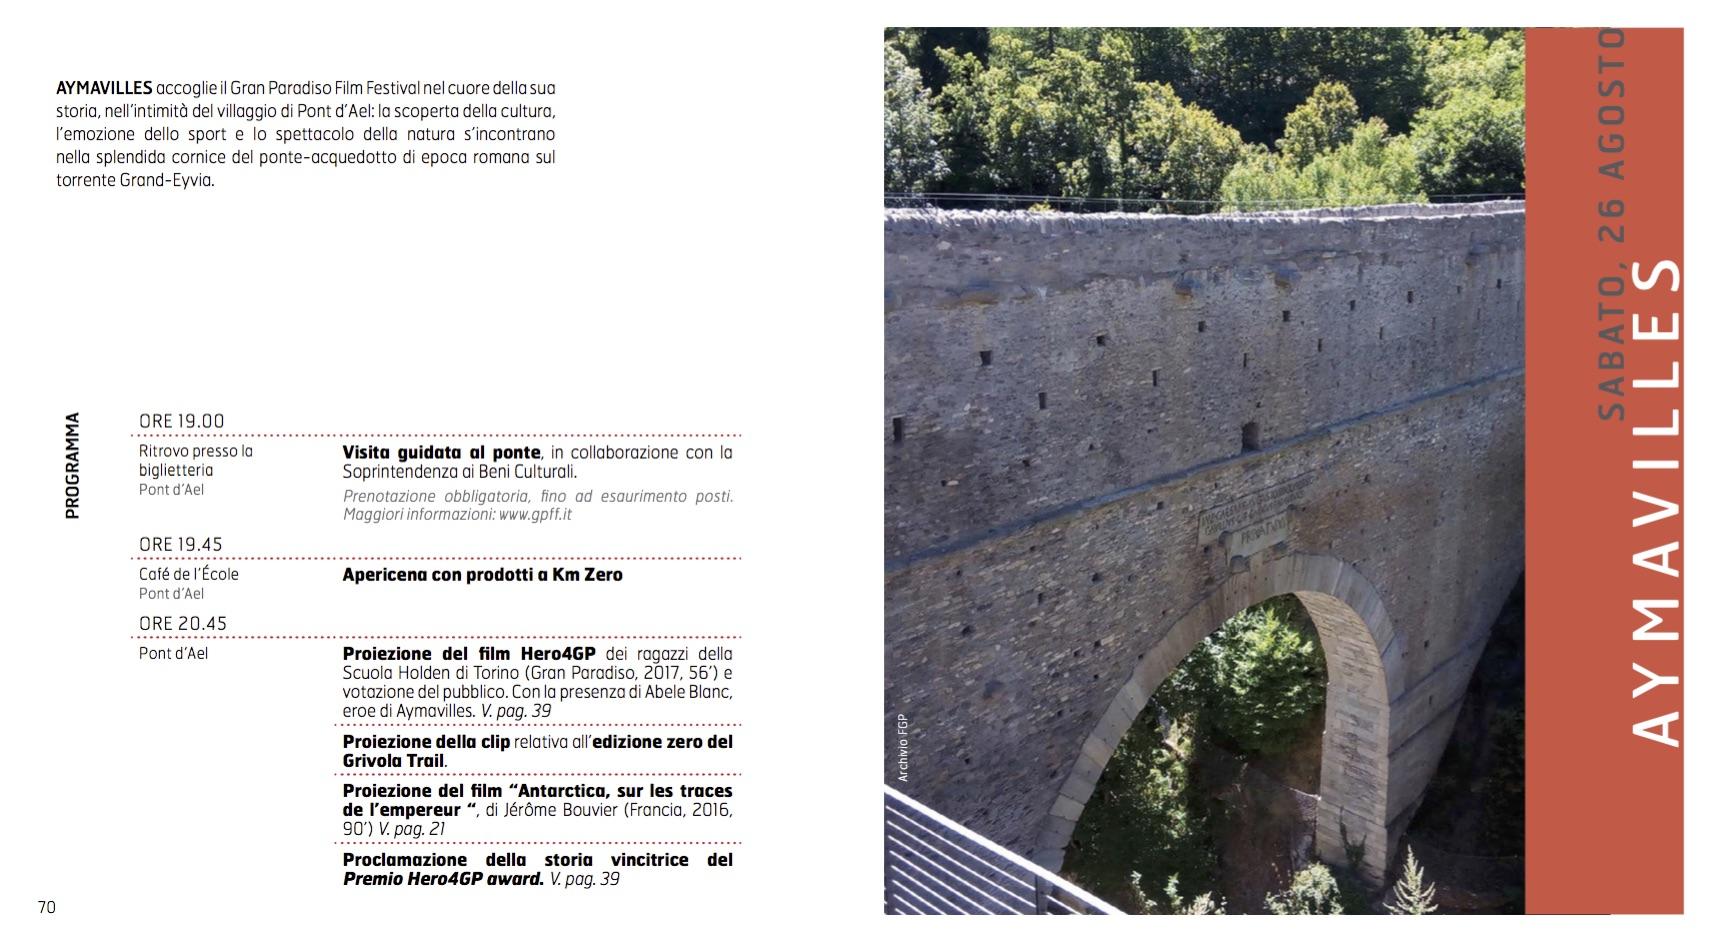 Programma Aymavilles GPFF edizione 20